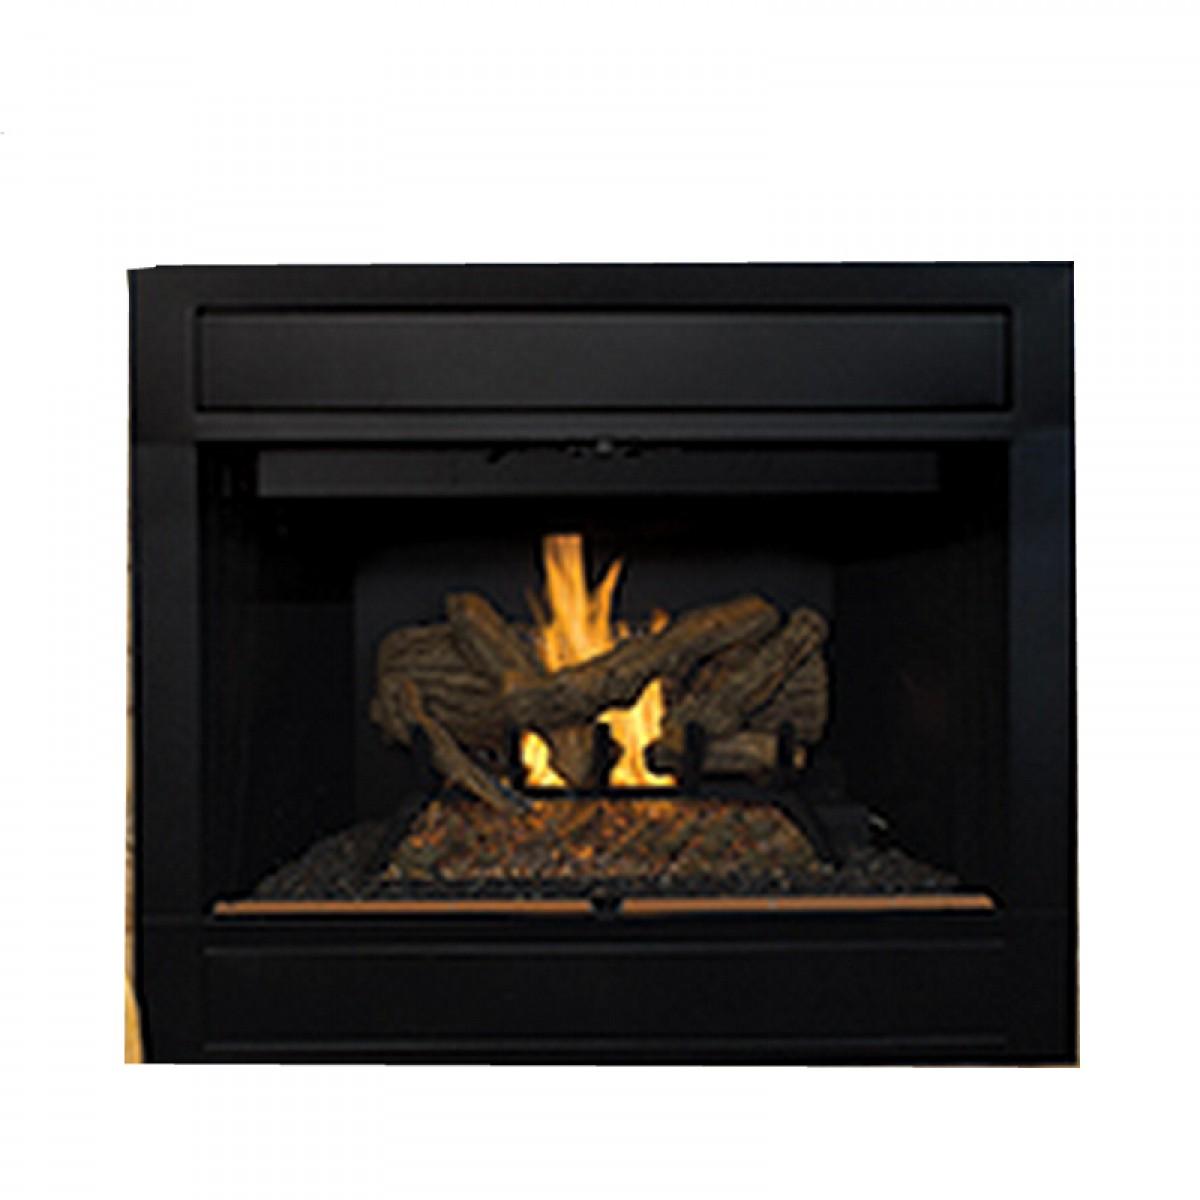 ... IHP Superior BRT4000 B-VENT Gas Fireplace ... - IHP Superior BRT4500 B-VENT Gas Fireplace